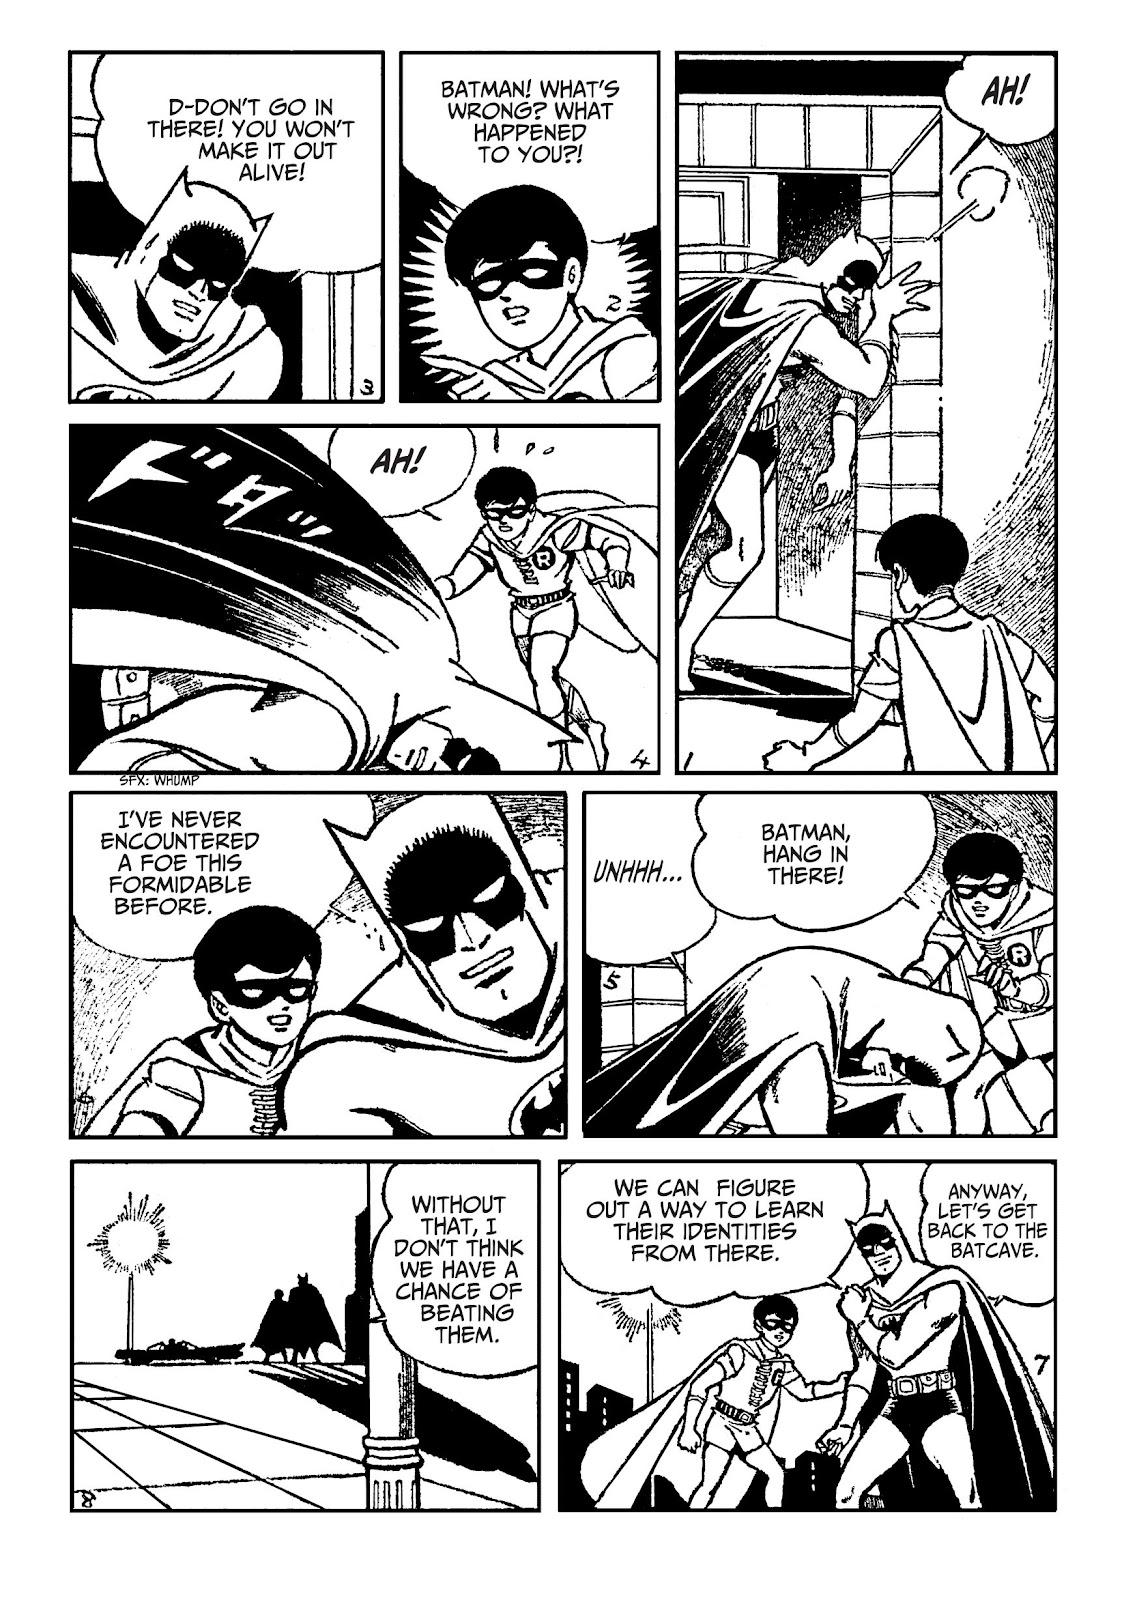 Read online Batman - The Jiro Kuwata Batmanga comic -  Issue #51 - 5